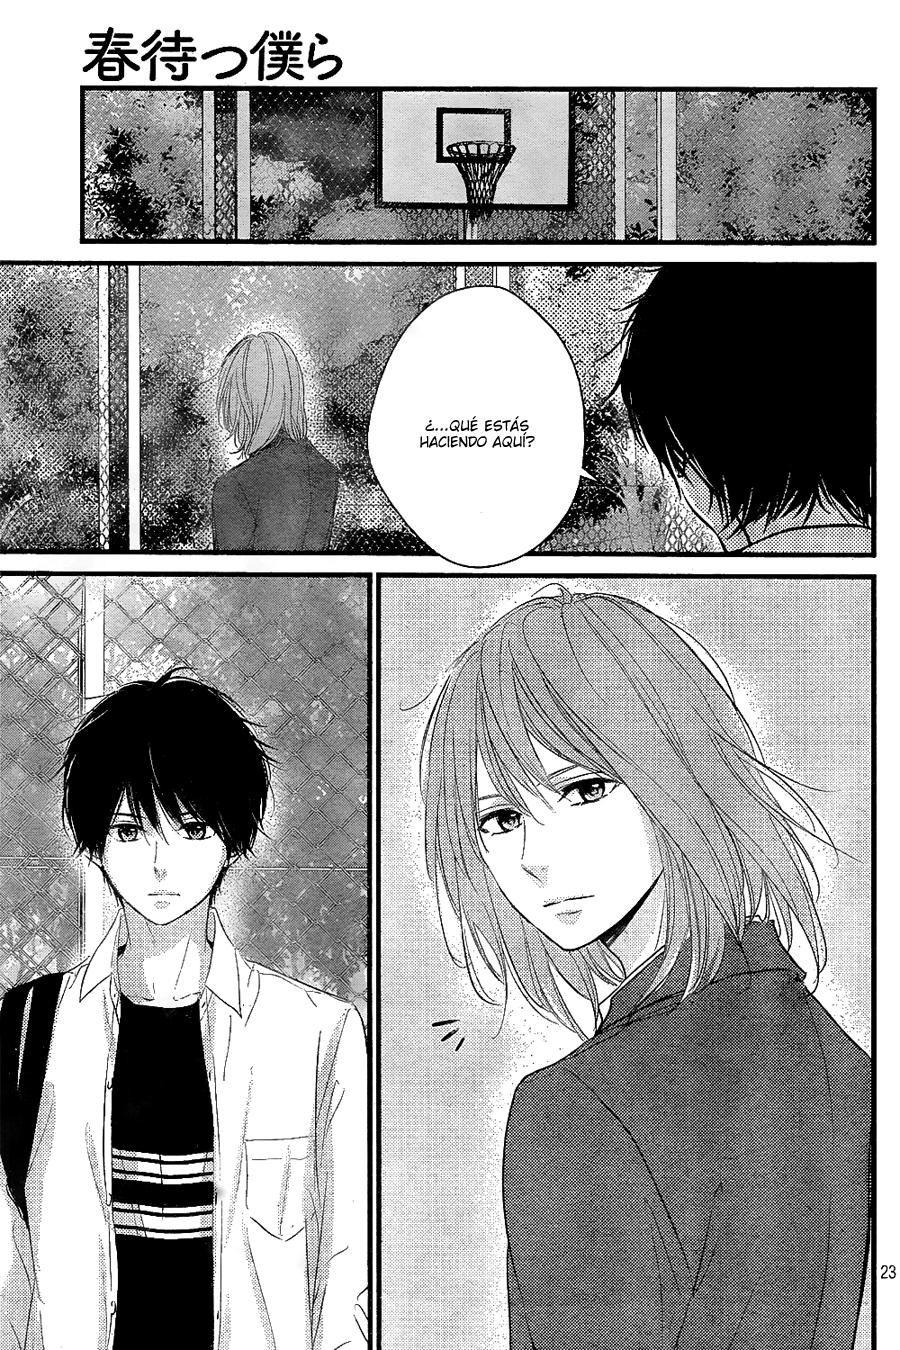 Haru Matsu Bokura Capítulo 8 página 24 - Leer Manga en Español gratis en NineManga.com